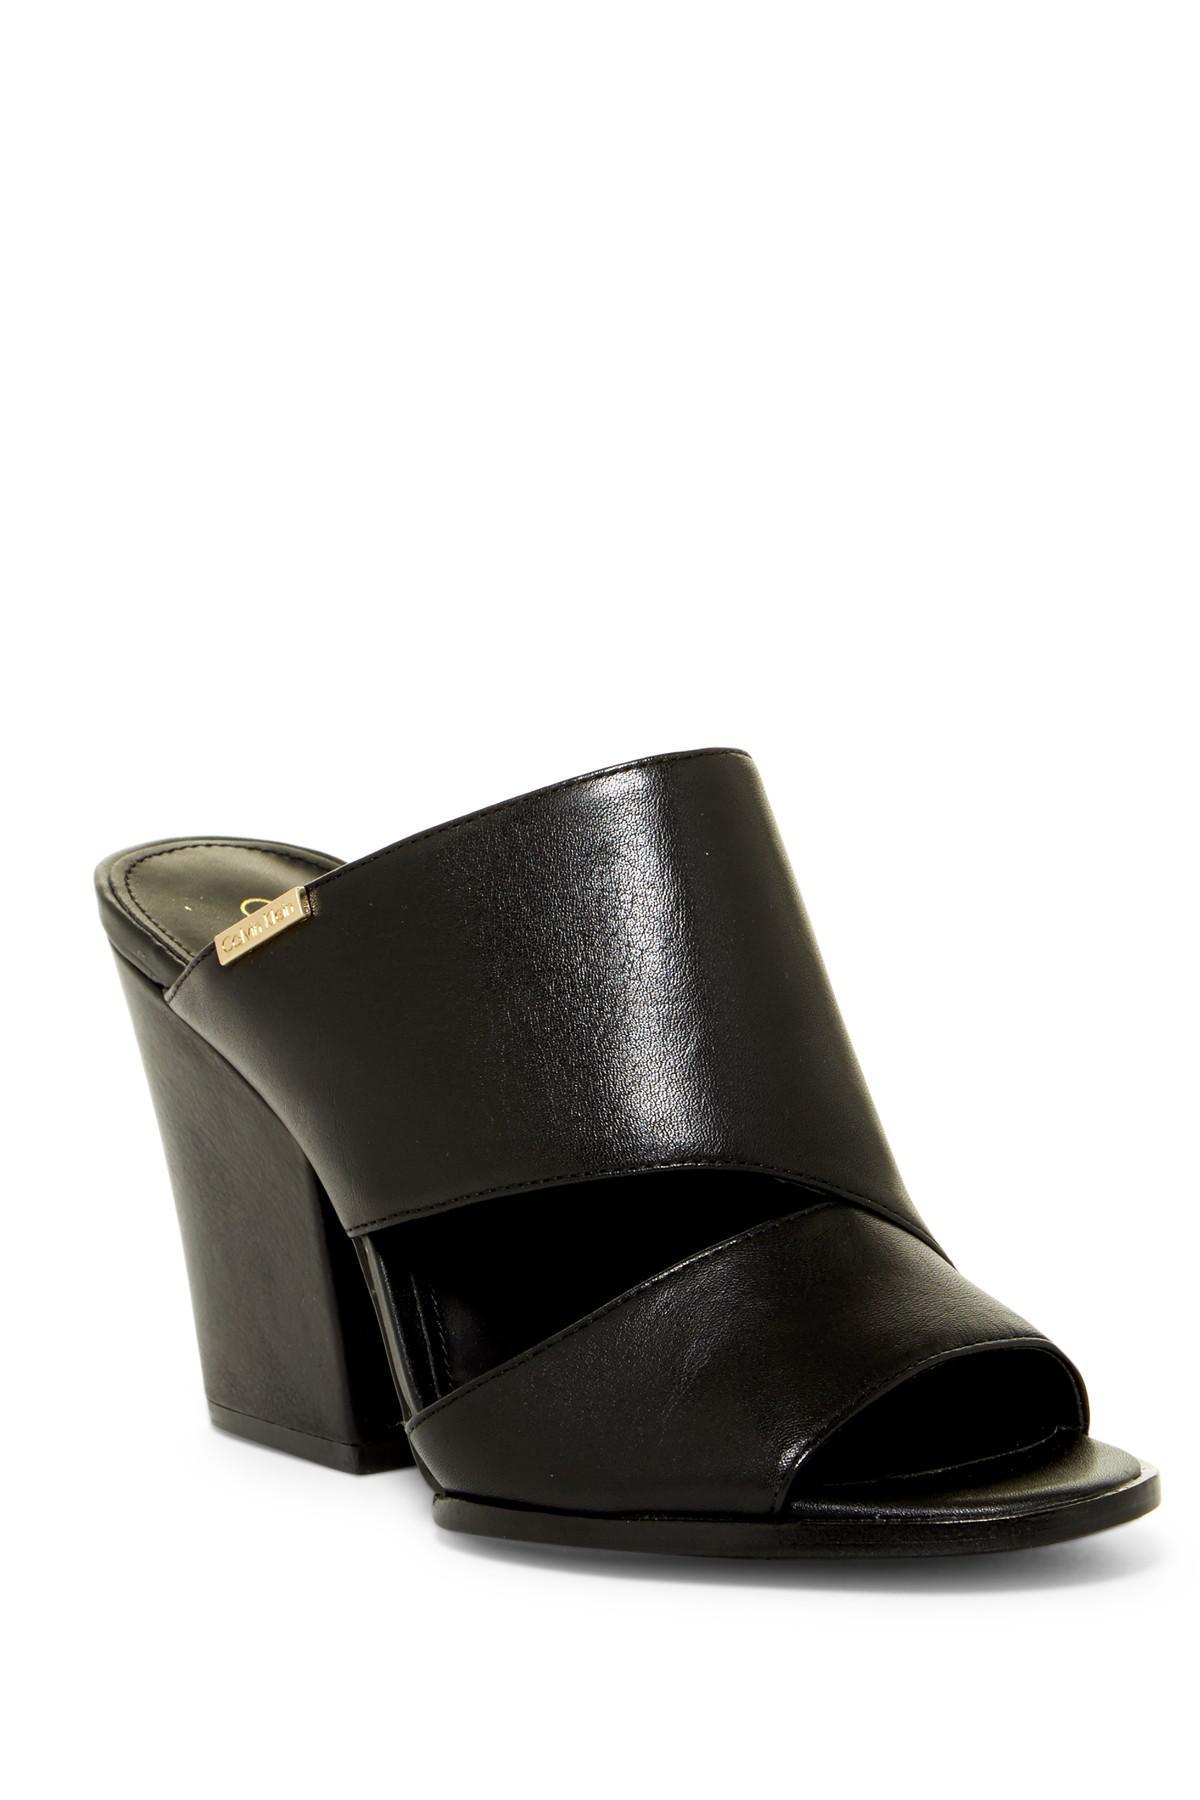 c44453db854 Lyst - Calvin Klein Wiley Crevo Block Heel Sandal in Black